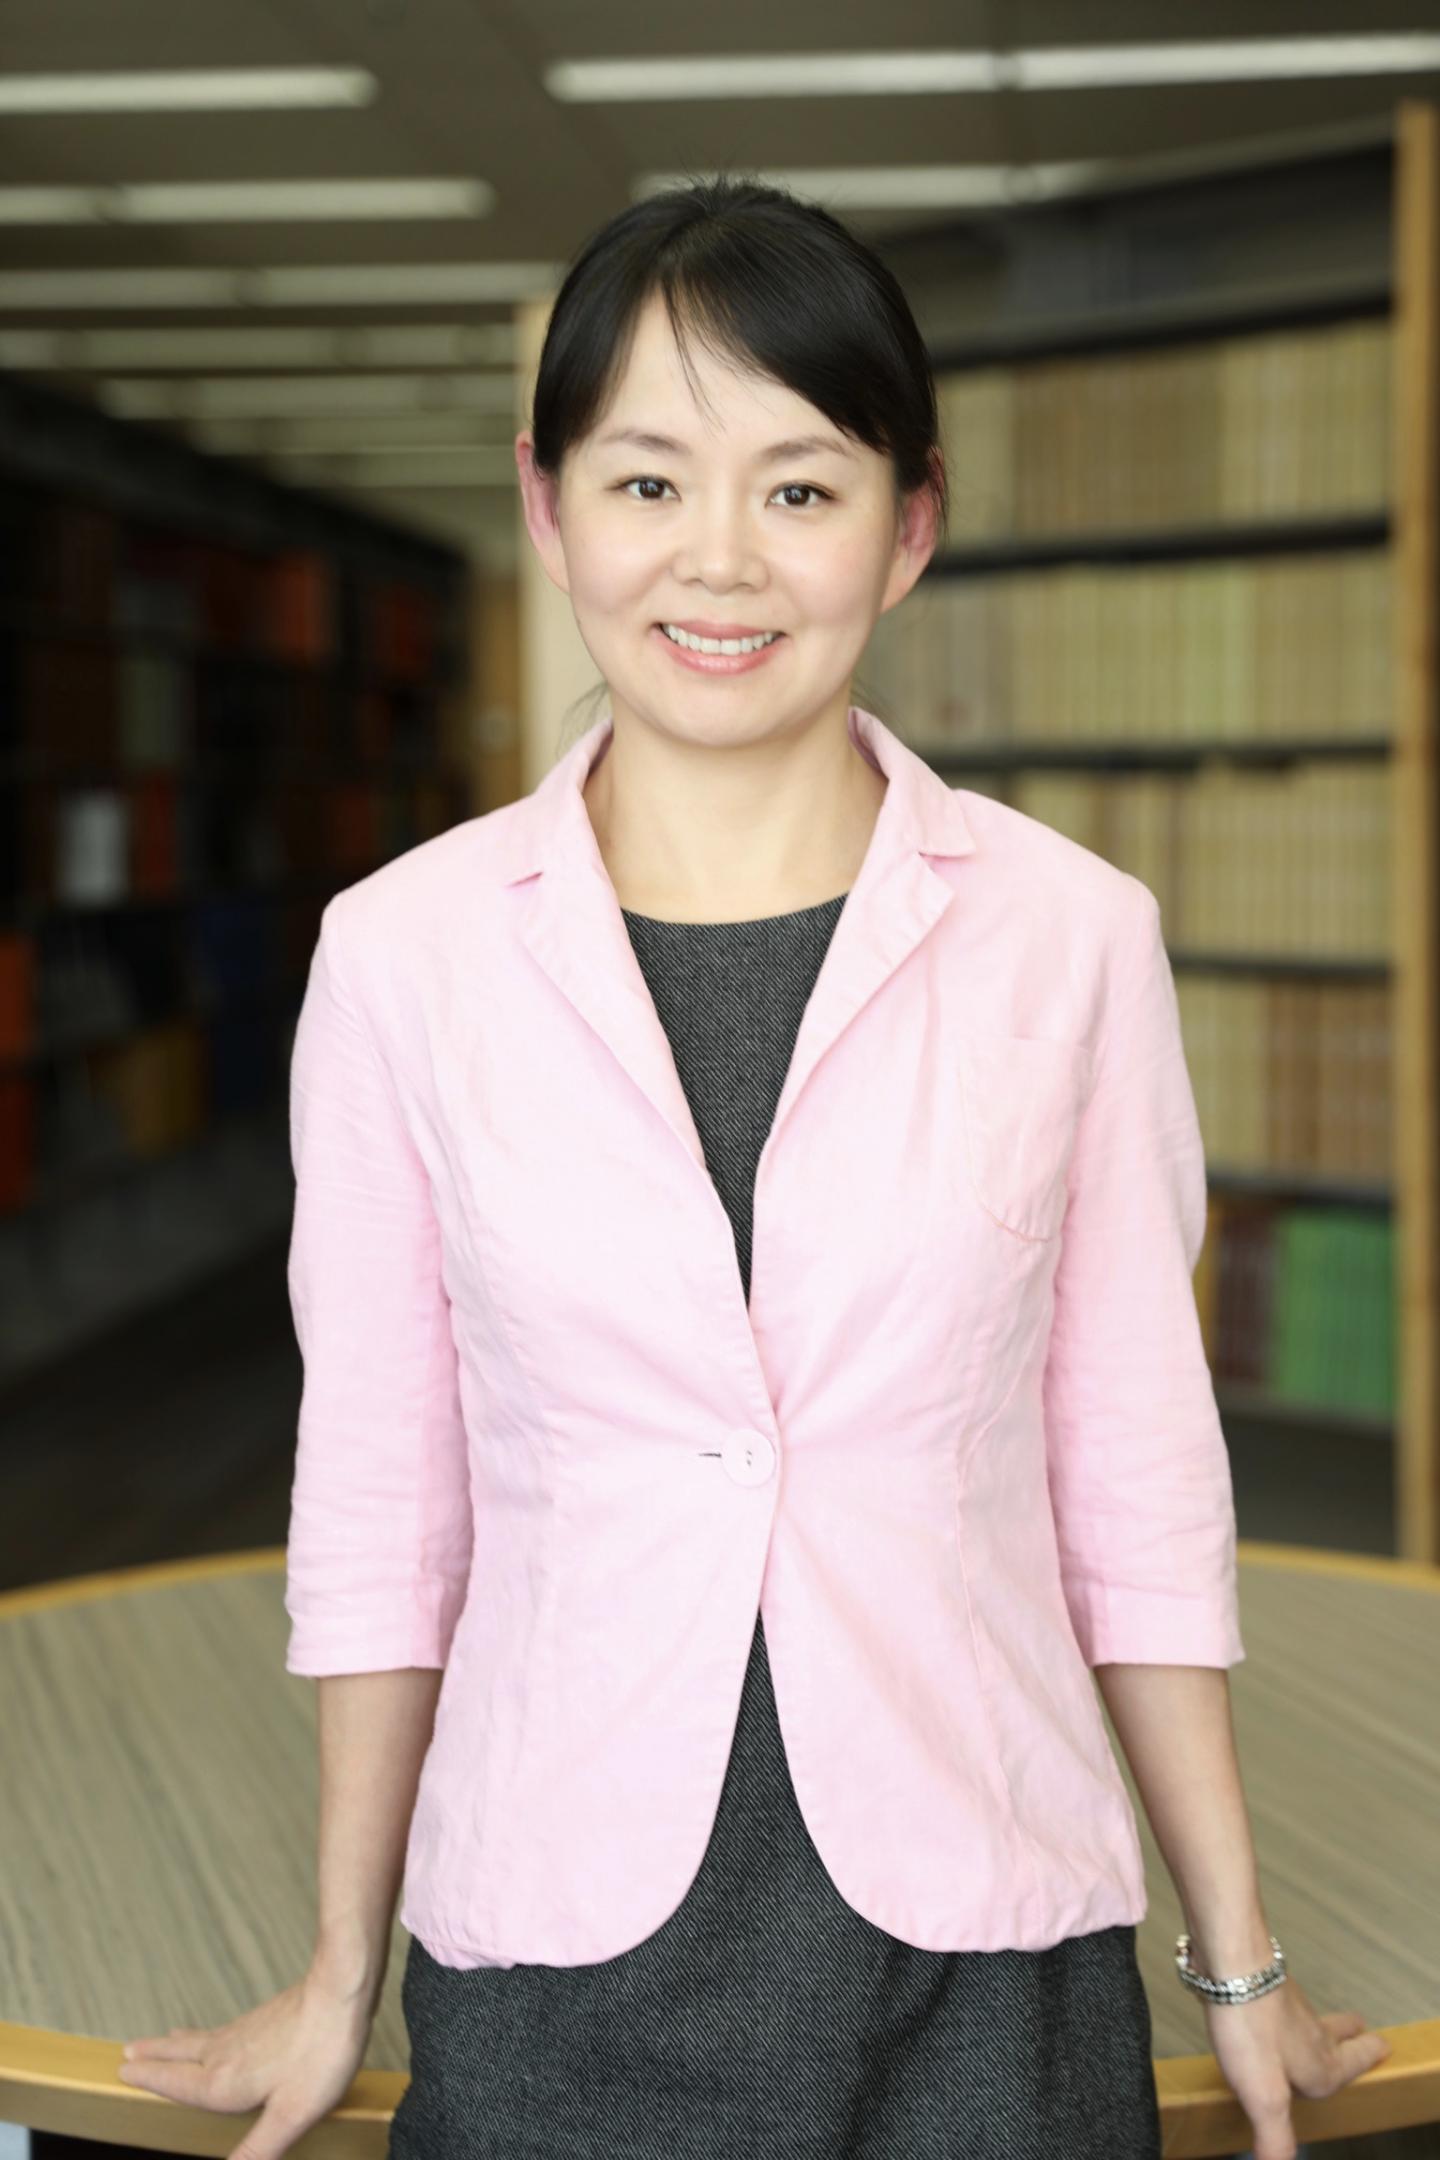 Dr. Alicia Hong